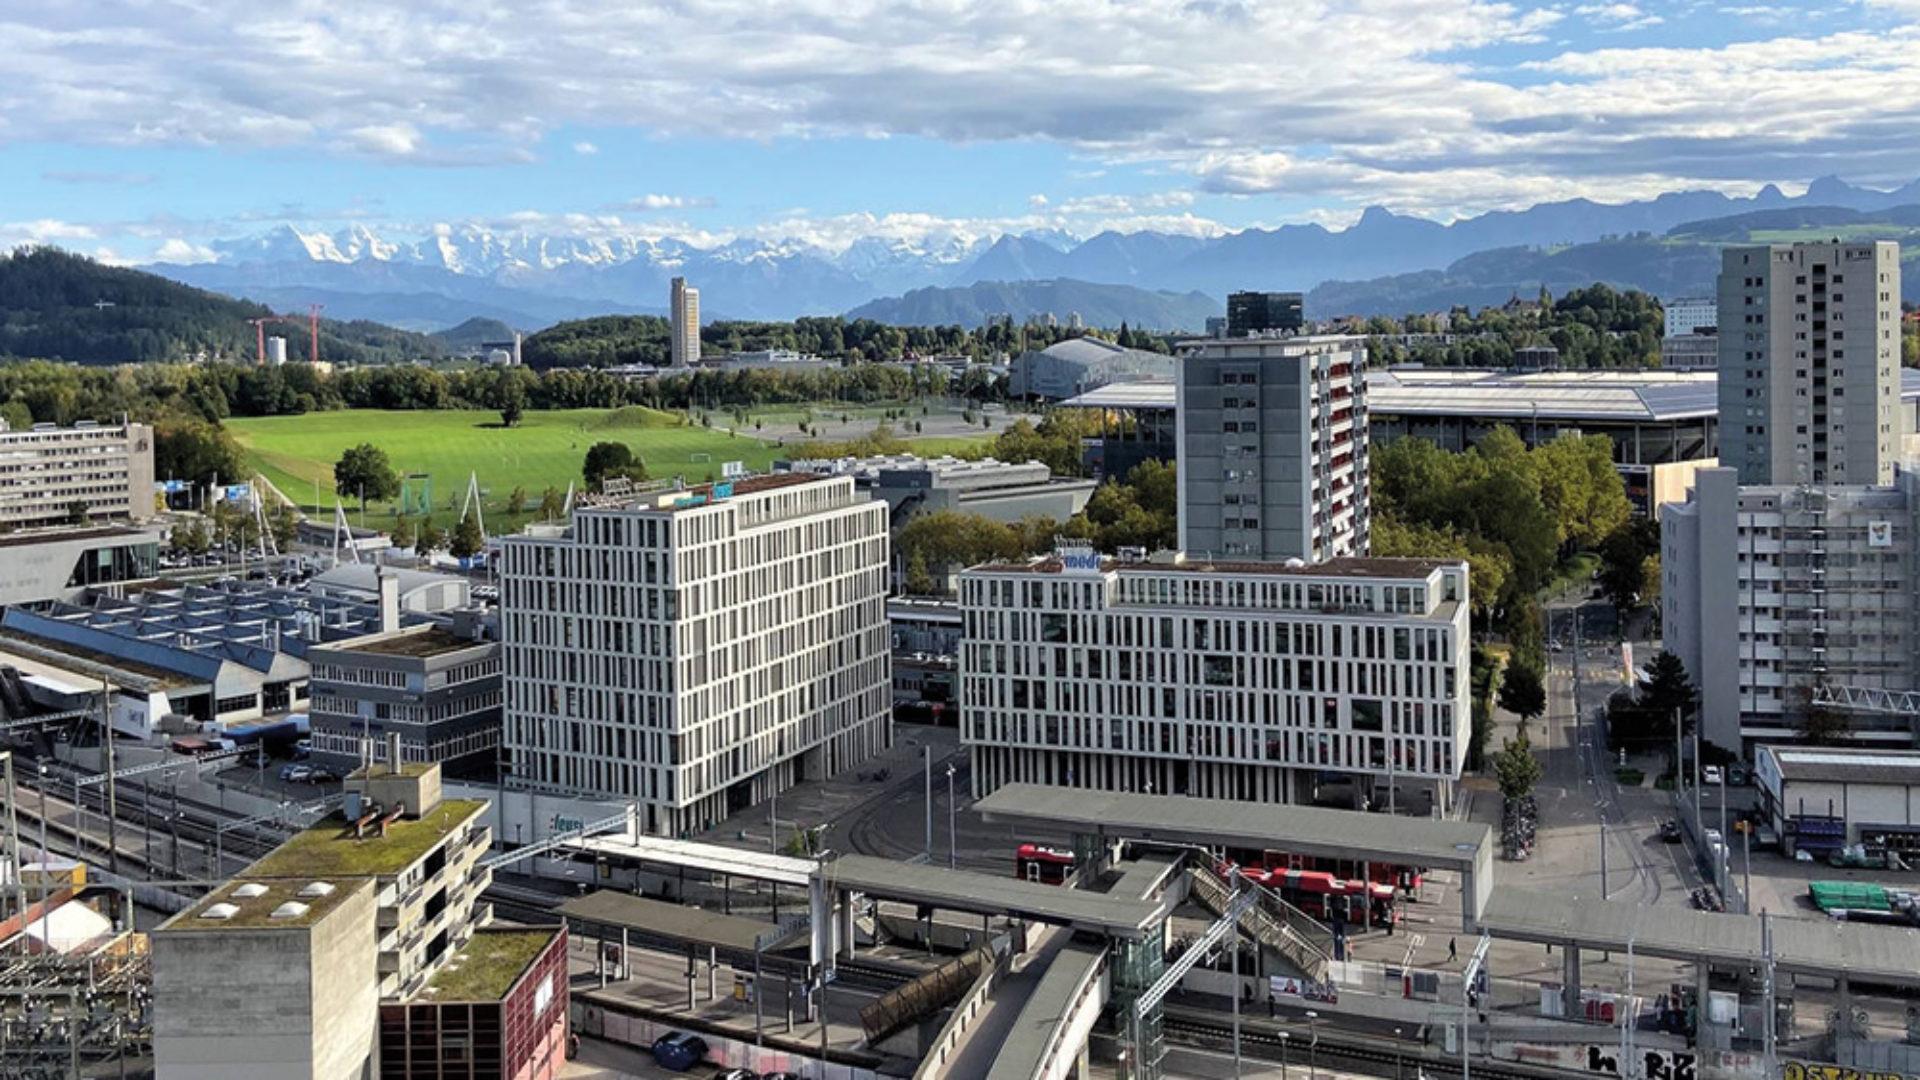 Beleuchtung_referenz_objekt_Spots_SUNNY_Neubau_Wankdorf_City_II_Trio_Bern_perdix